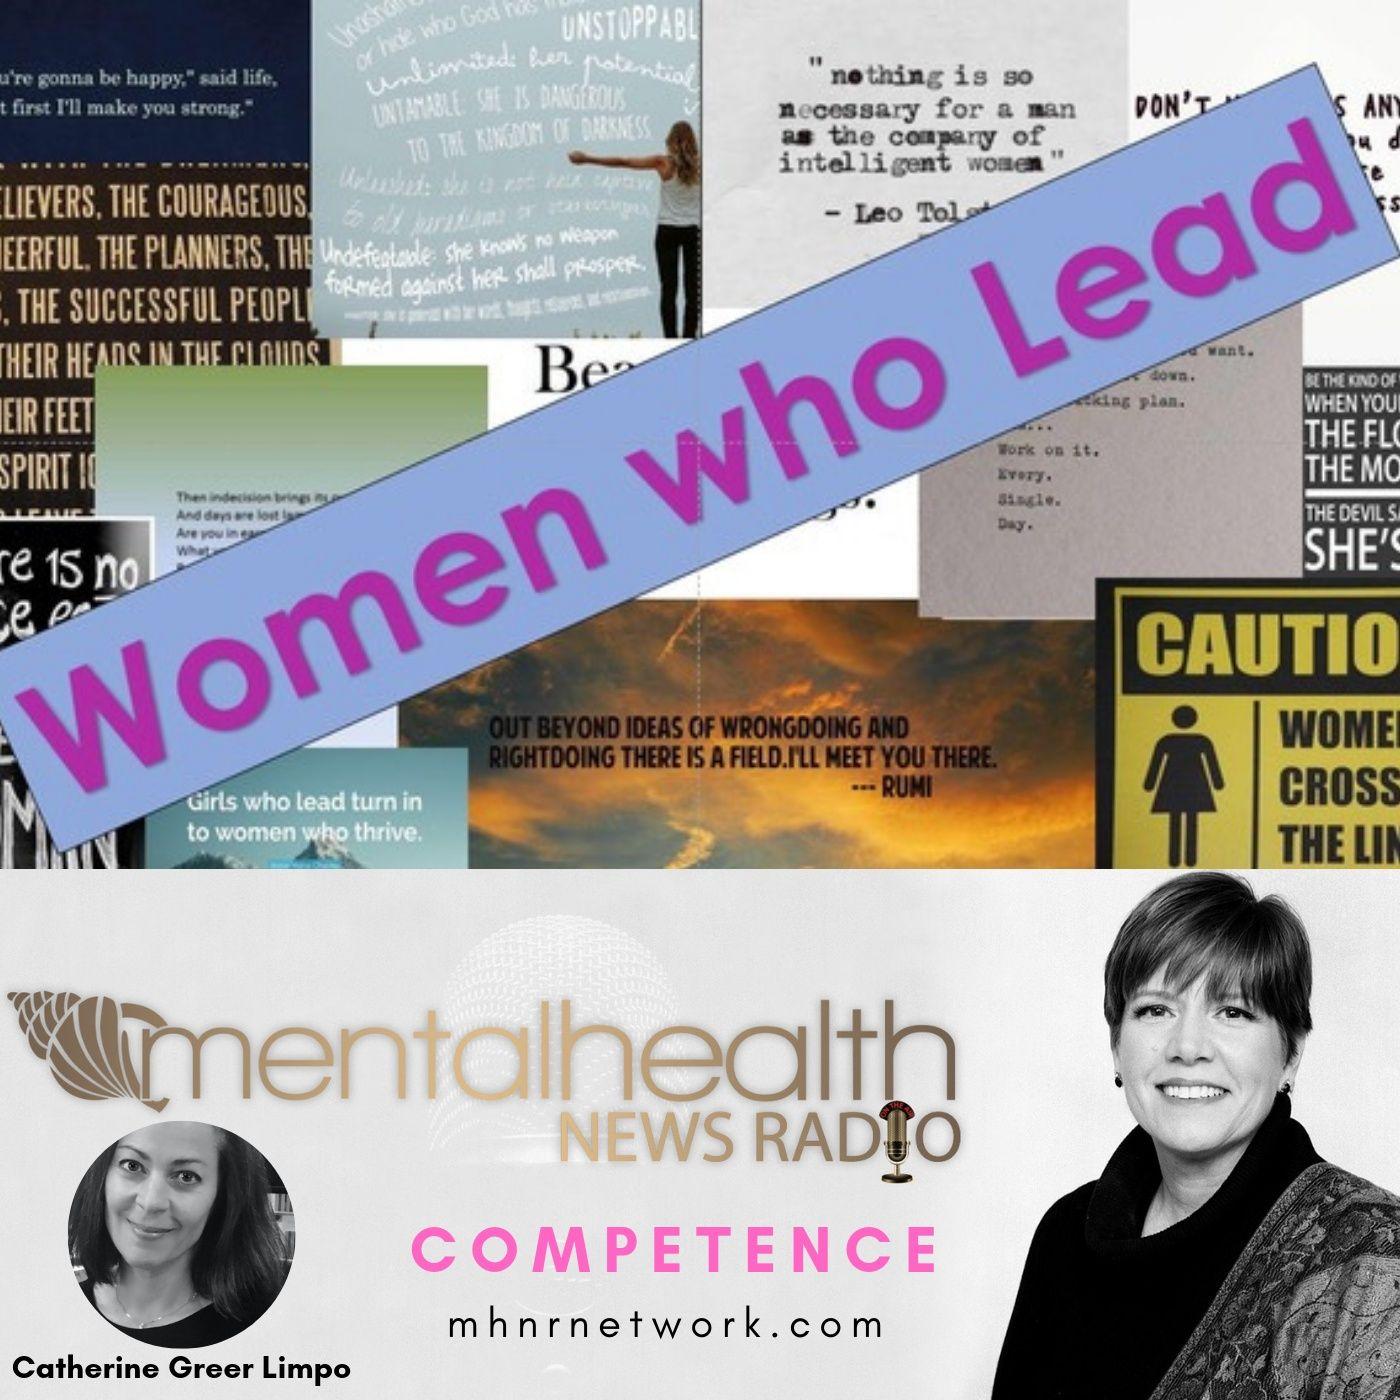 Mental Health News Radio - Women Who Lead: Competence